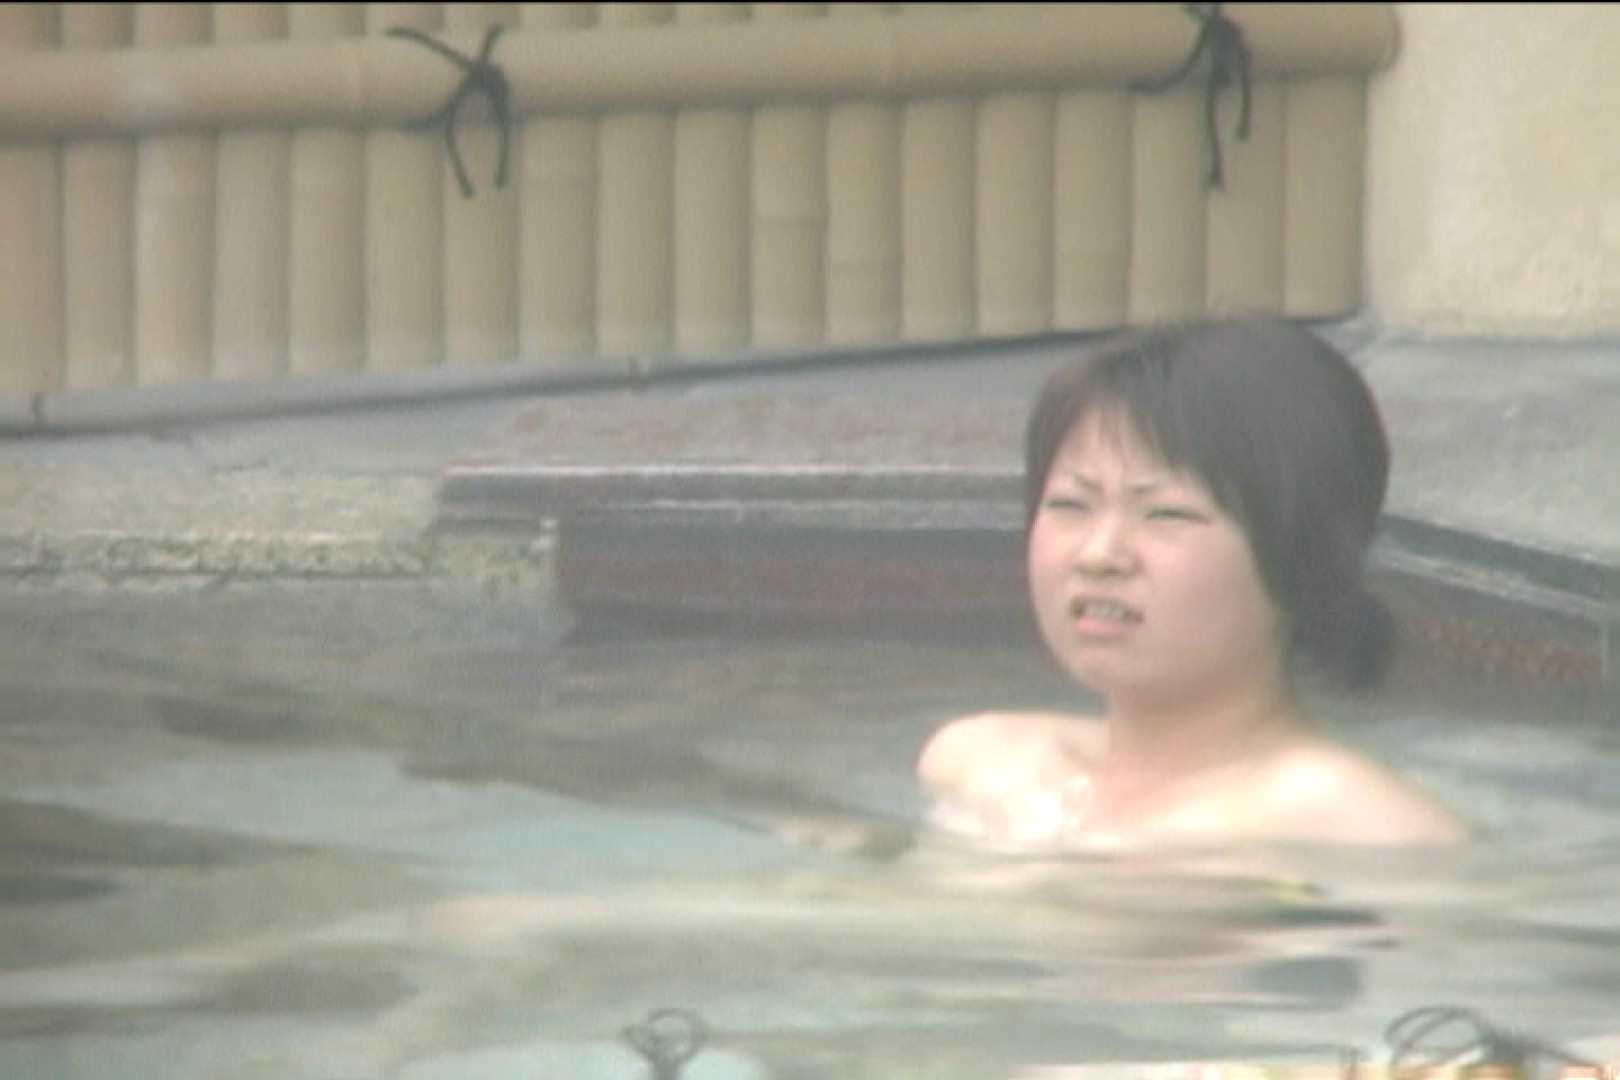 Aquaな露天風呂Vol.141 盗撮シリーズ   露天風呂編  96PIX 55